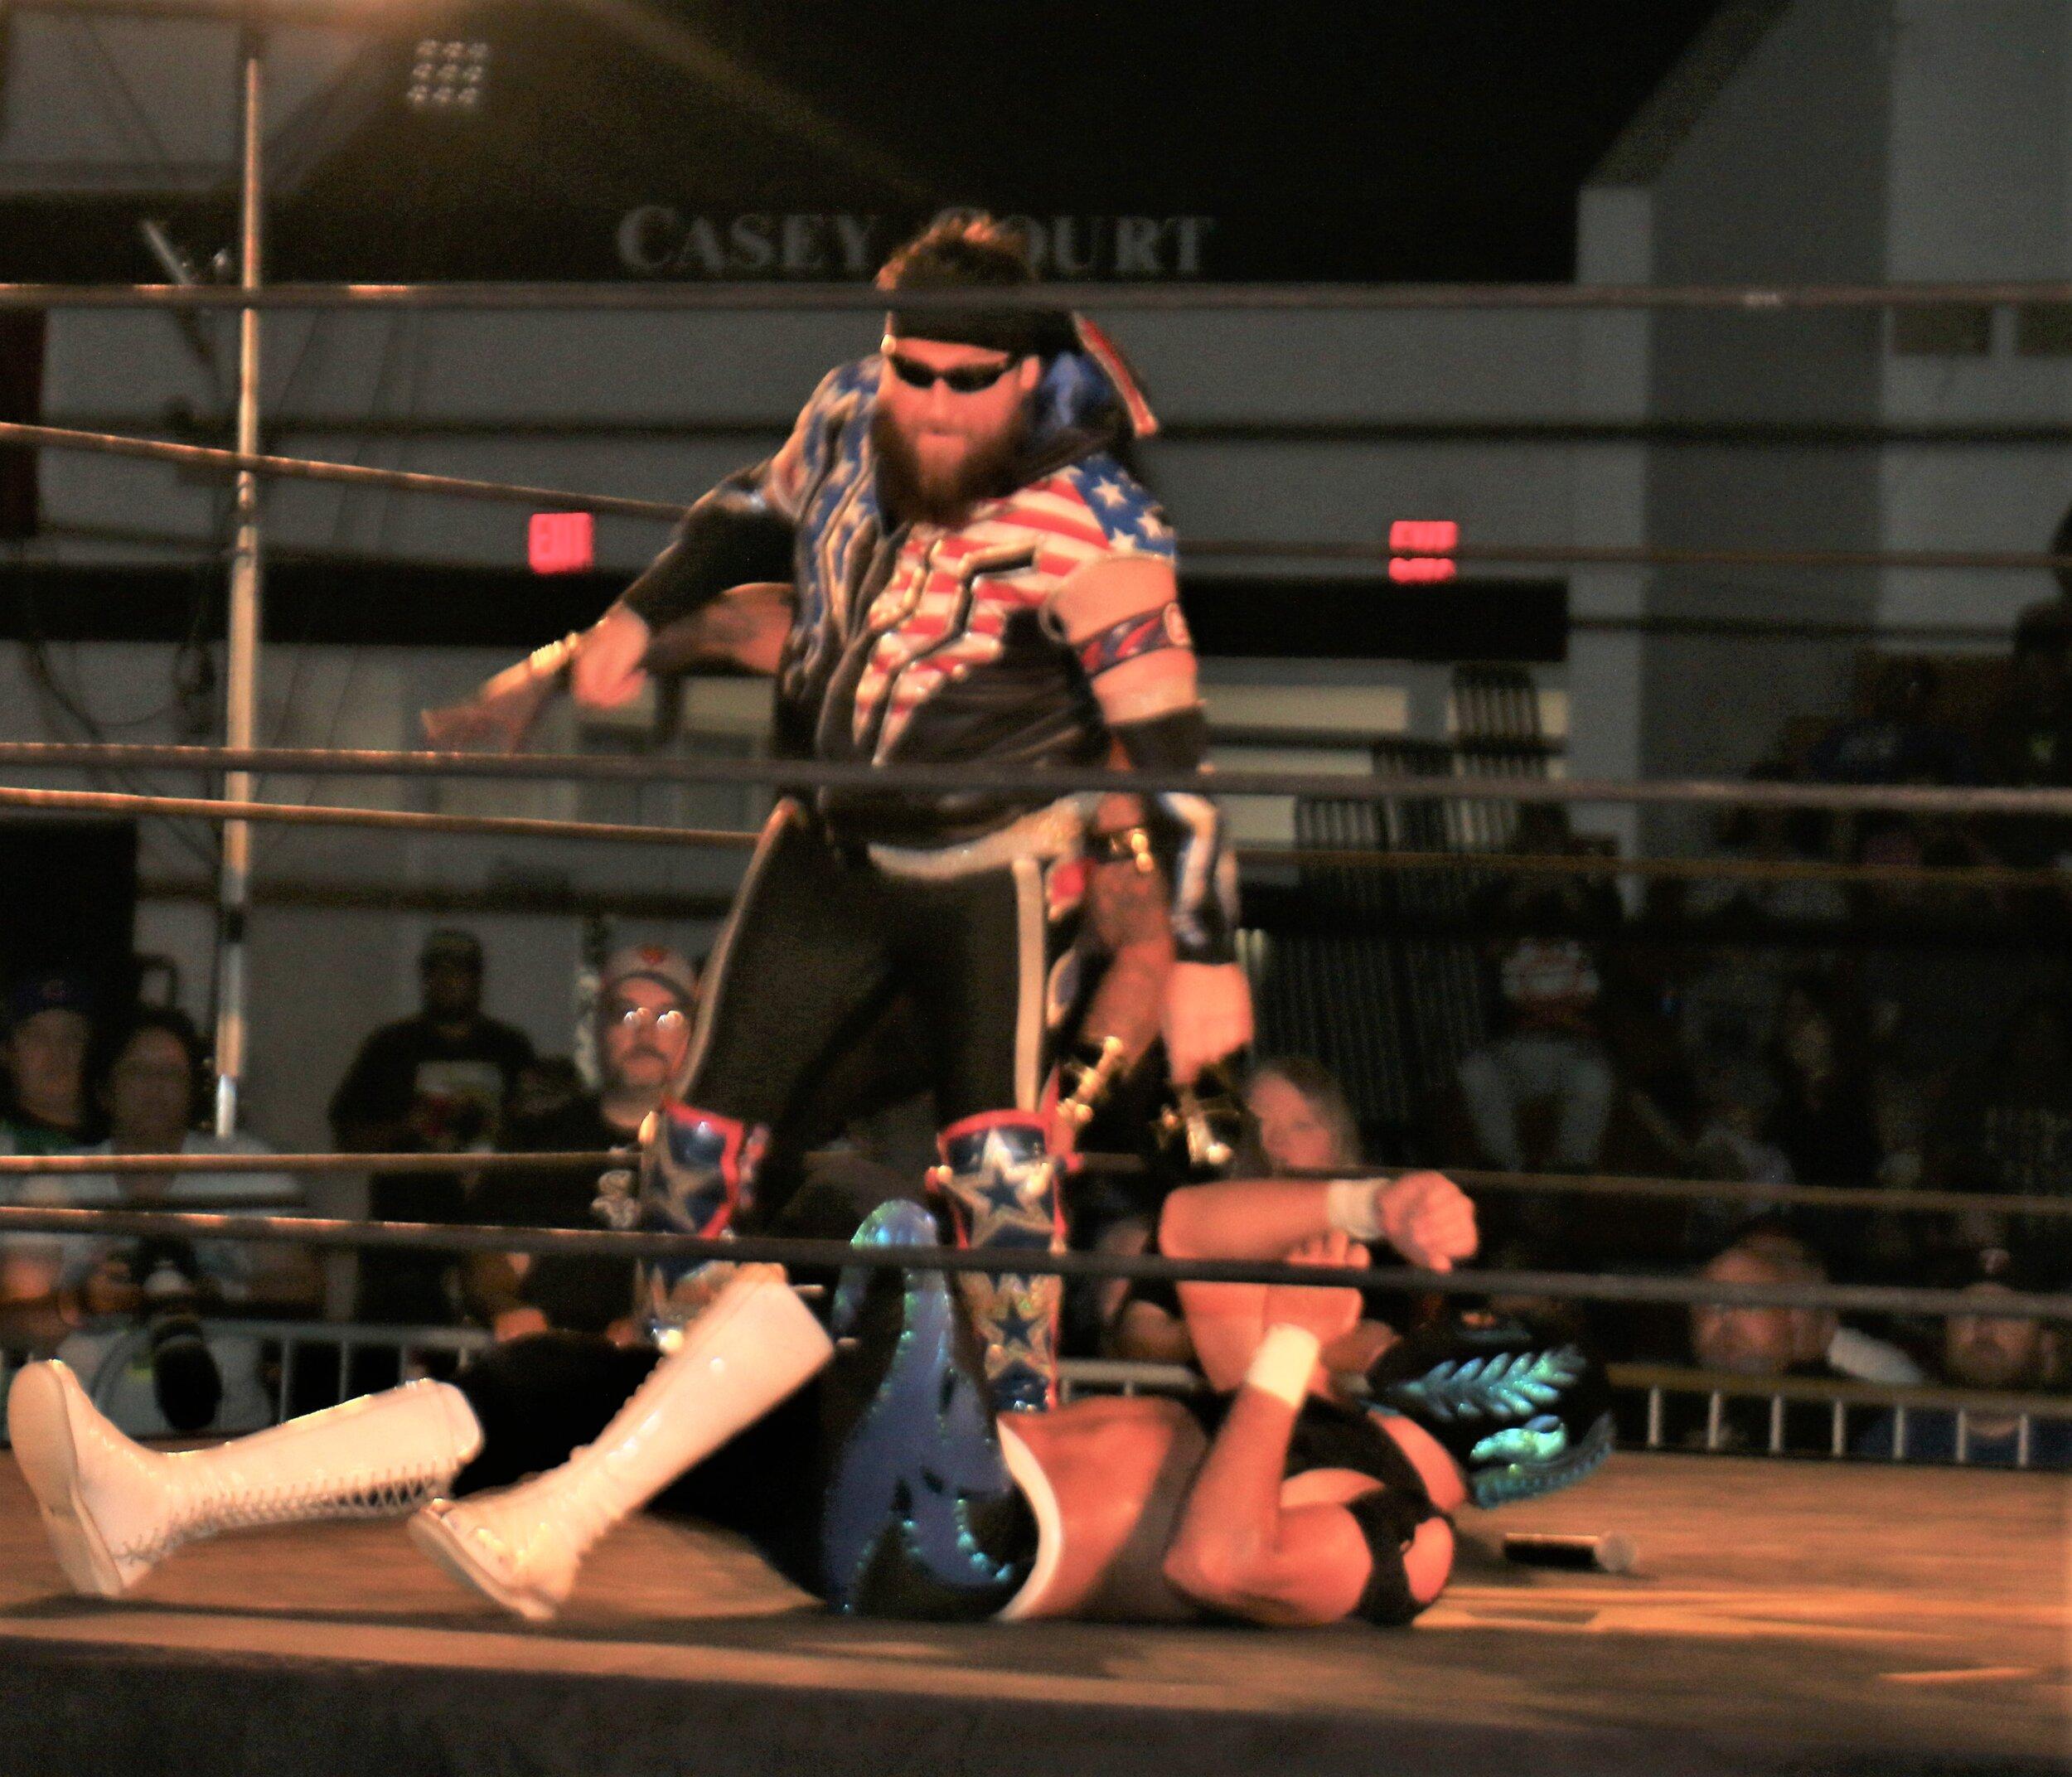 Gringo Loco attacks Sobreano Jr.